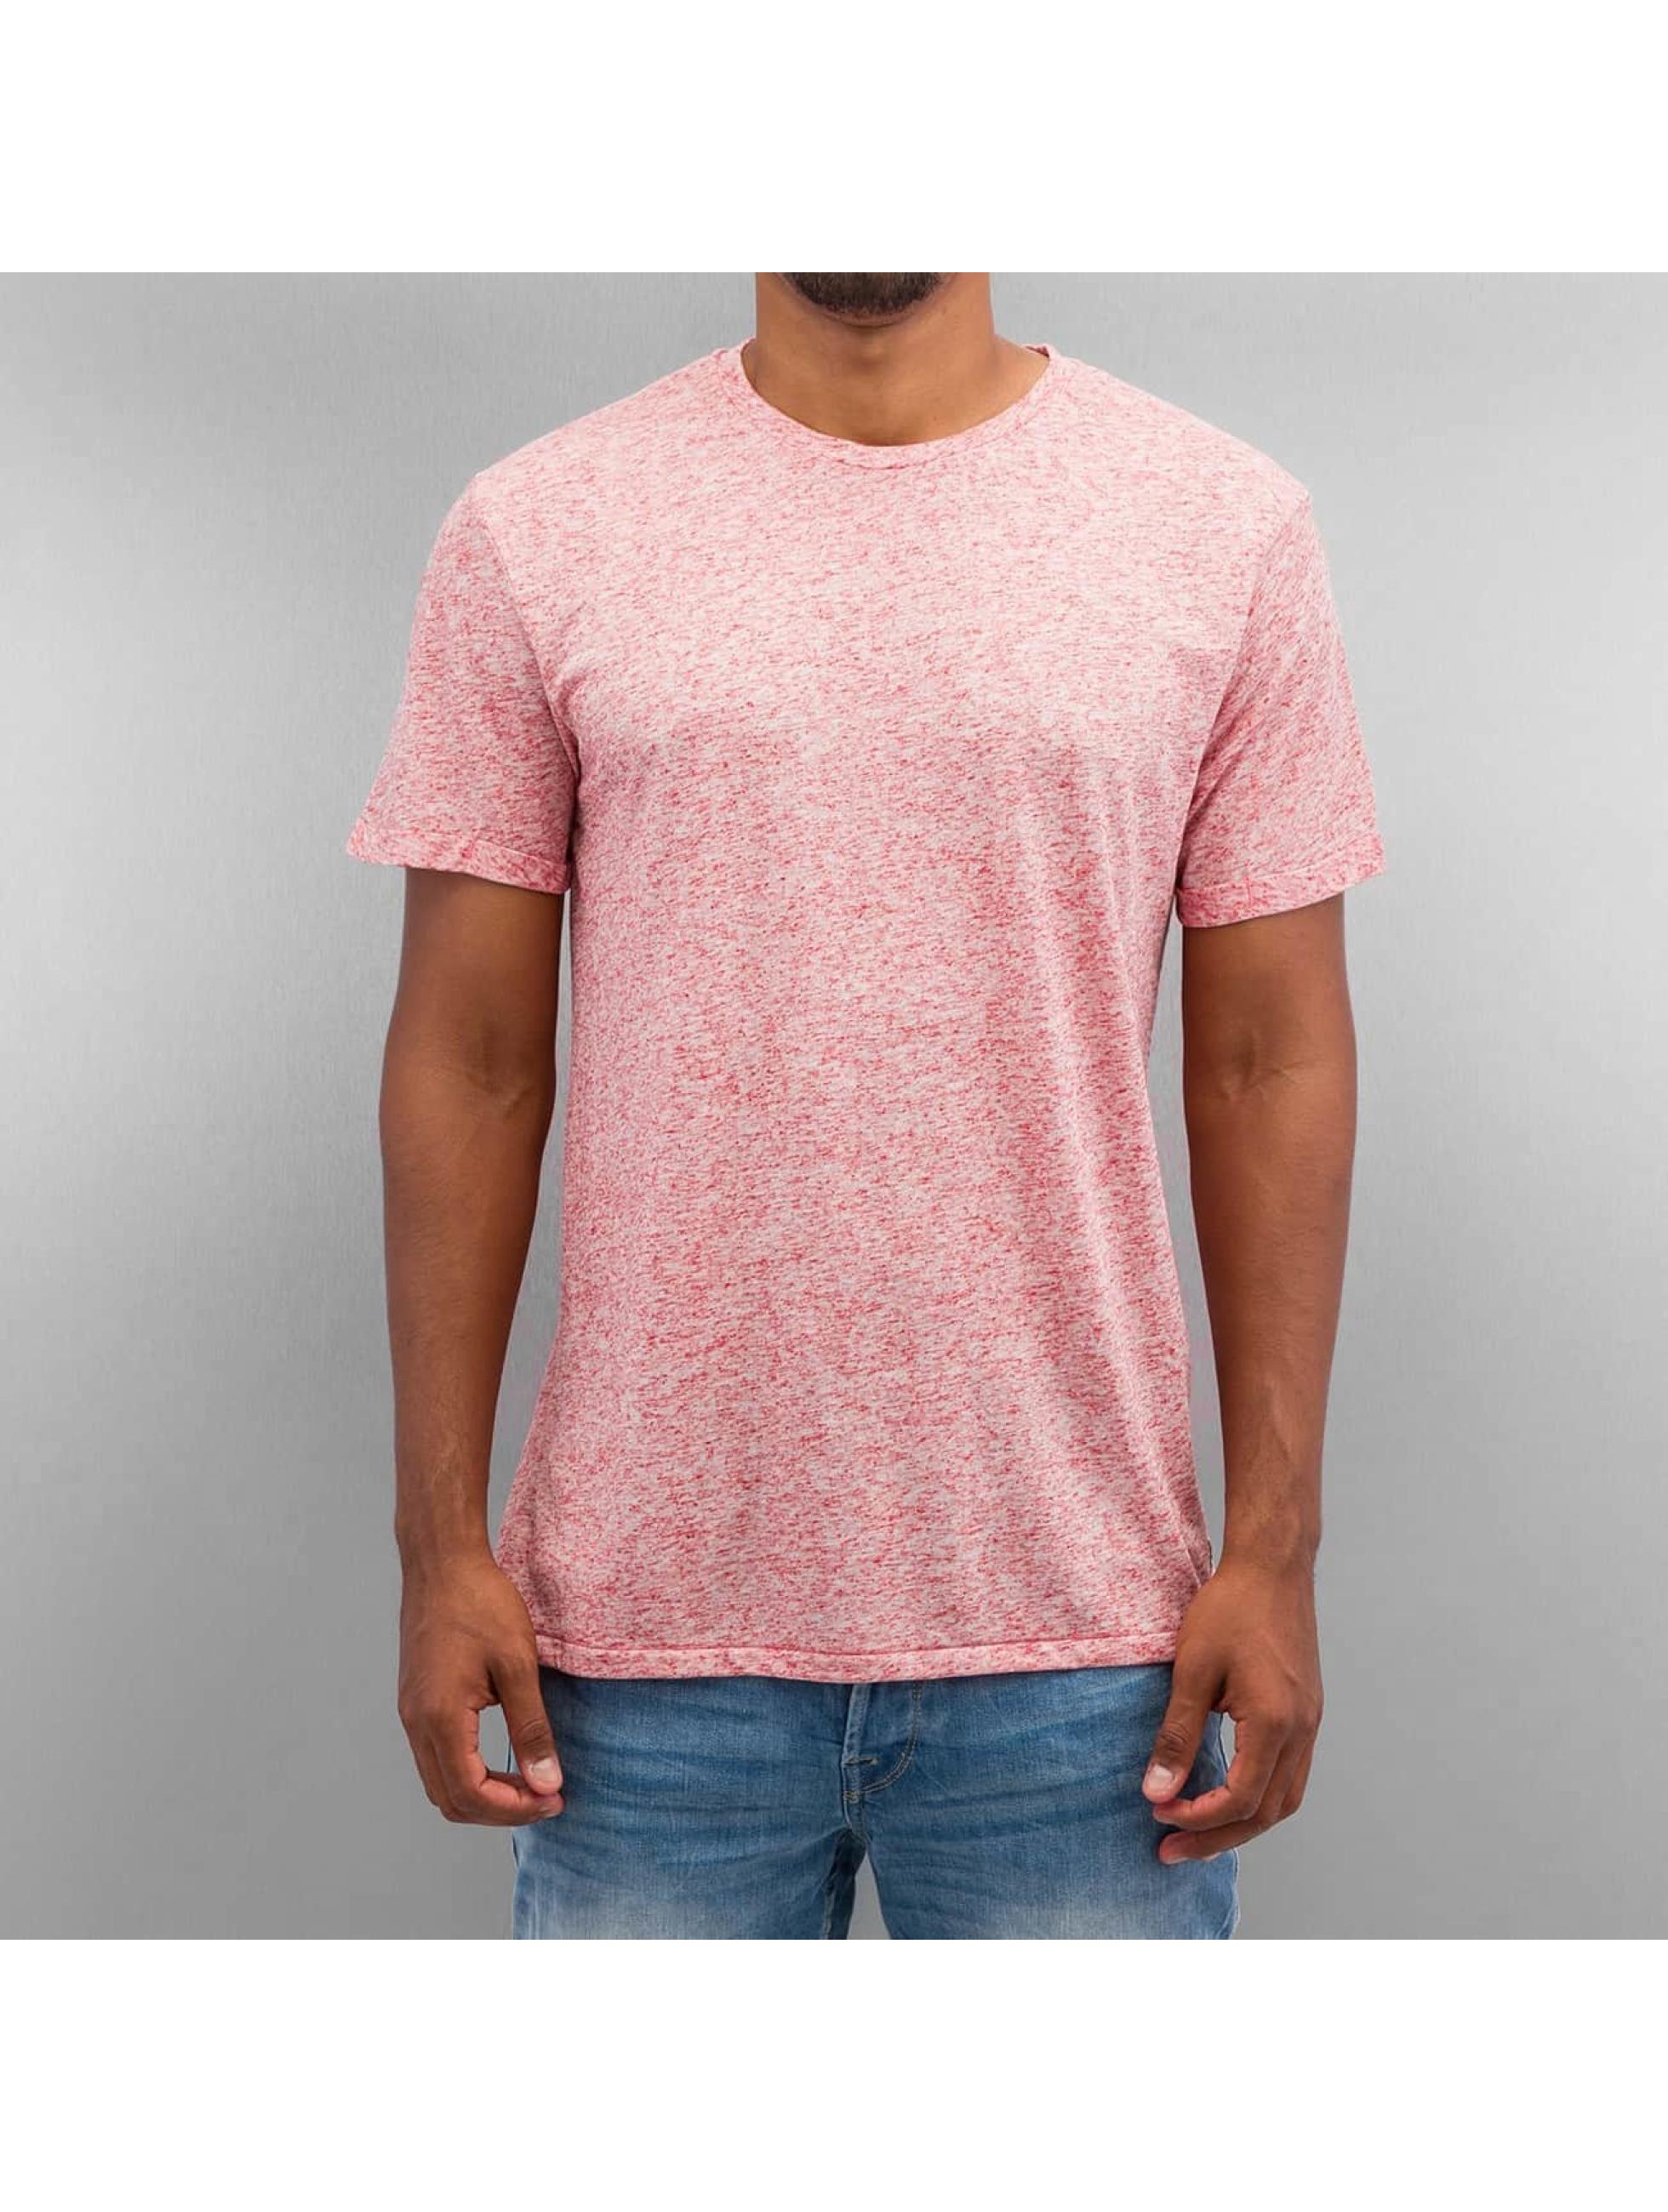 T-Shirt jorPack in rot